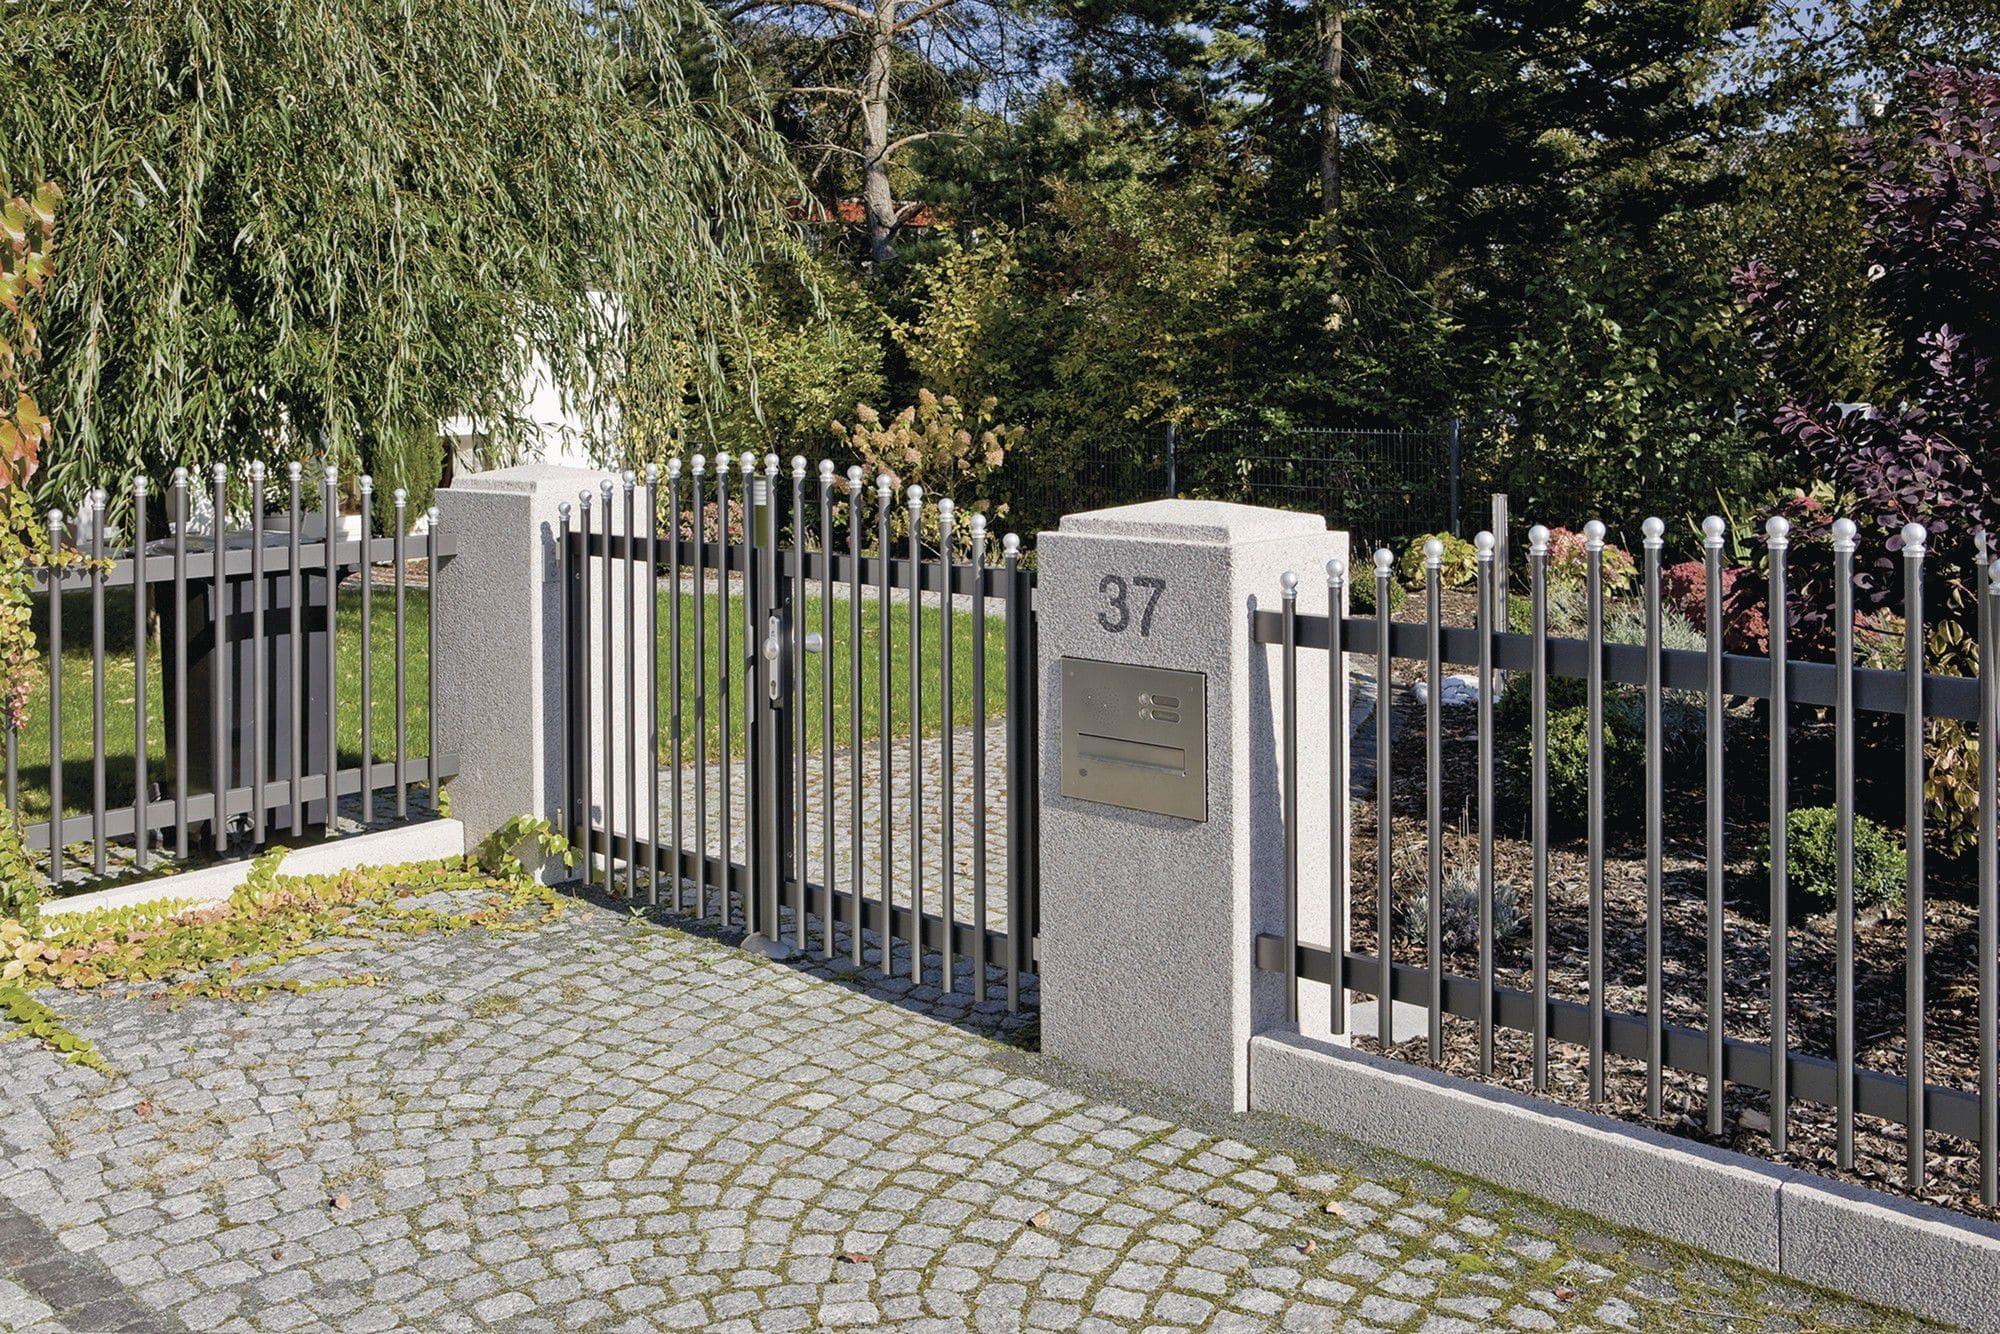 Zaunpfosten Rinn Beton Und Naturstein